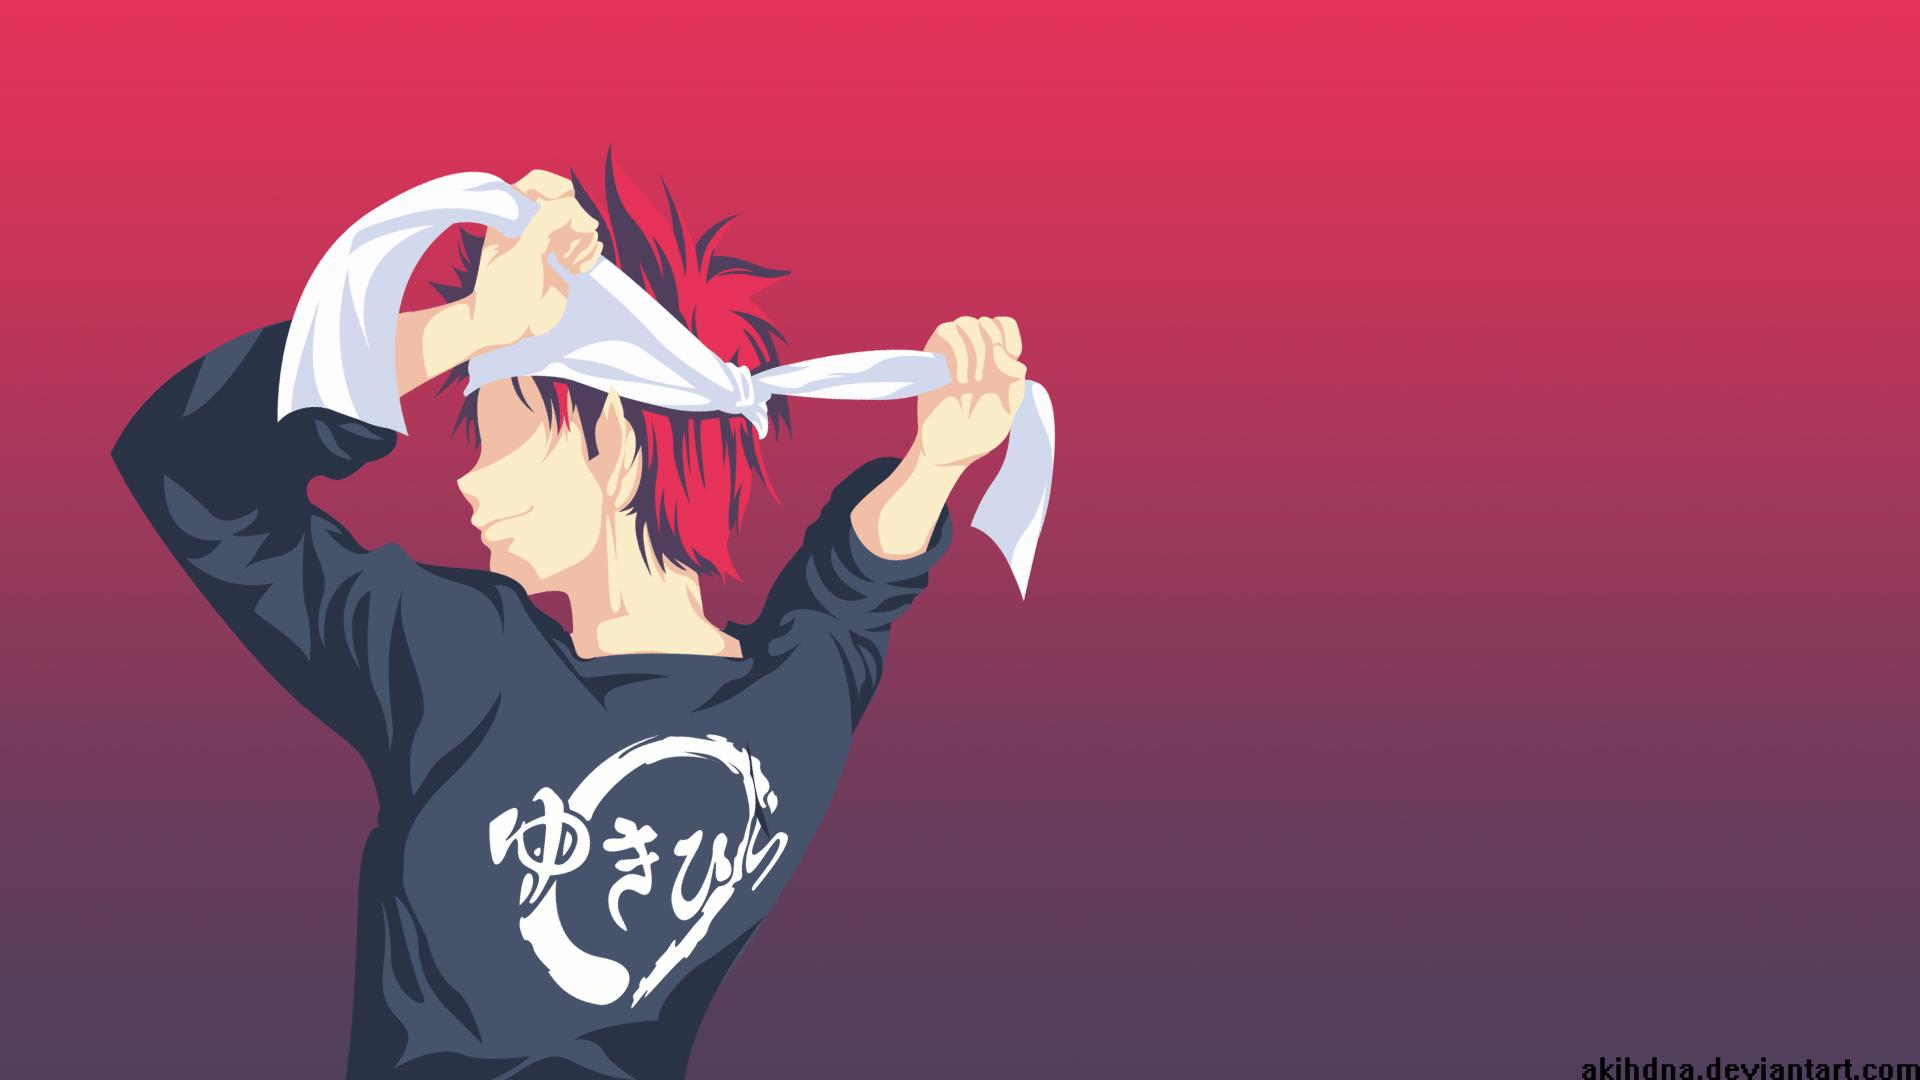 Food Wars!: Shokugeki No Soma Wallpapers - Wallpaper Cave